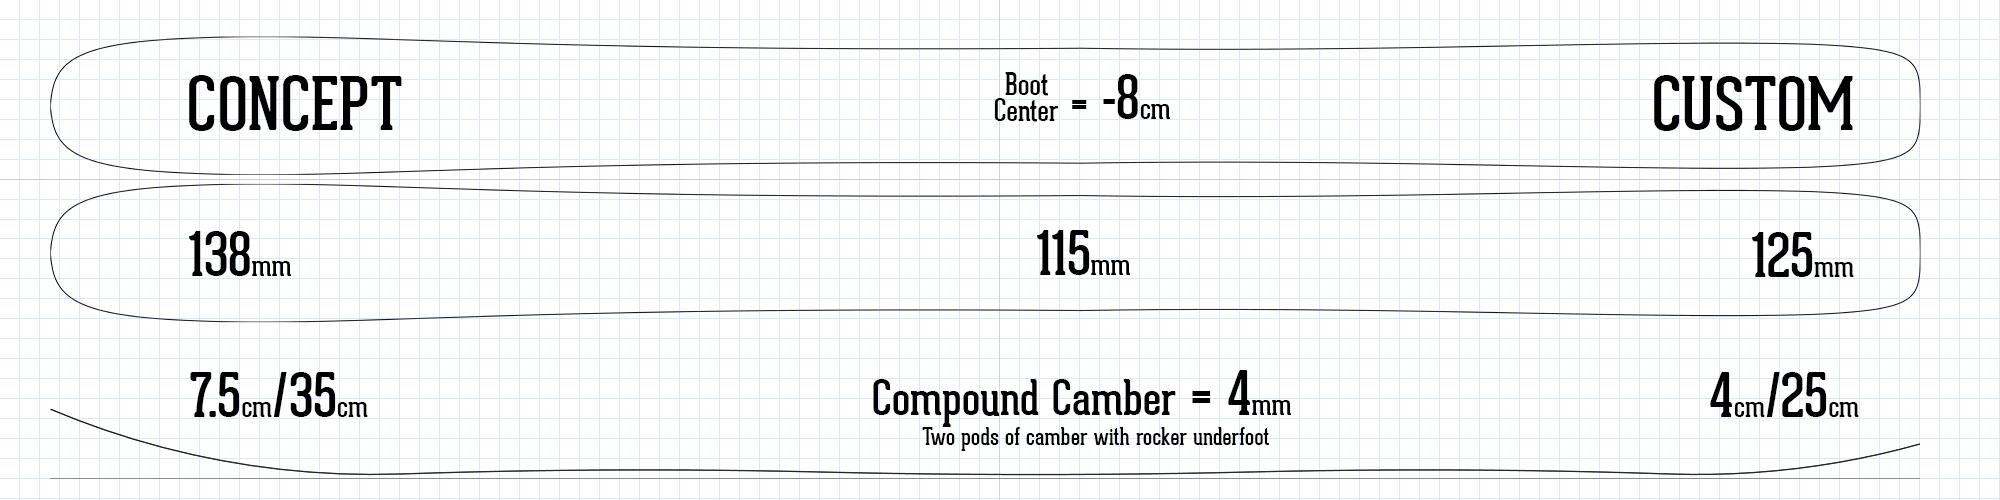 Concept ski information sheet rocker camber profile